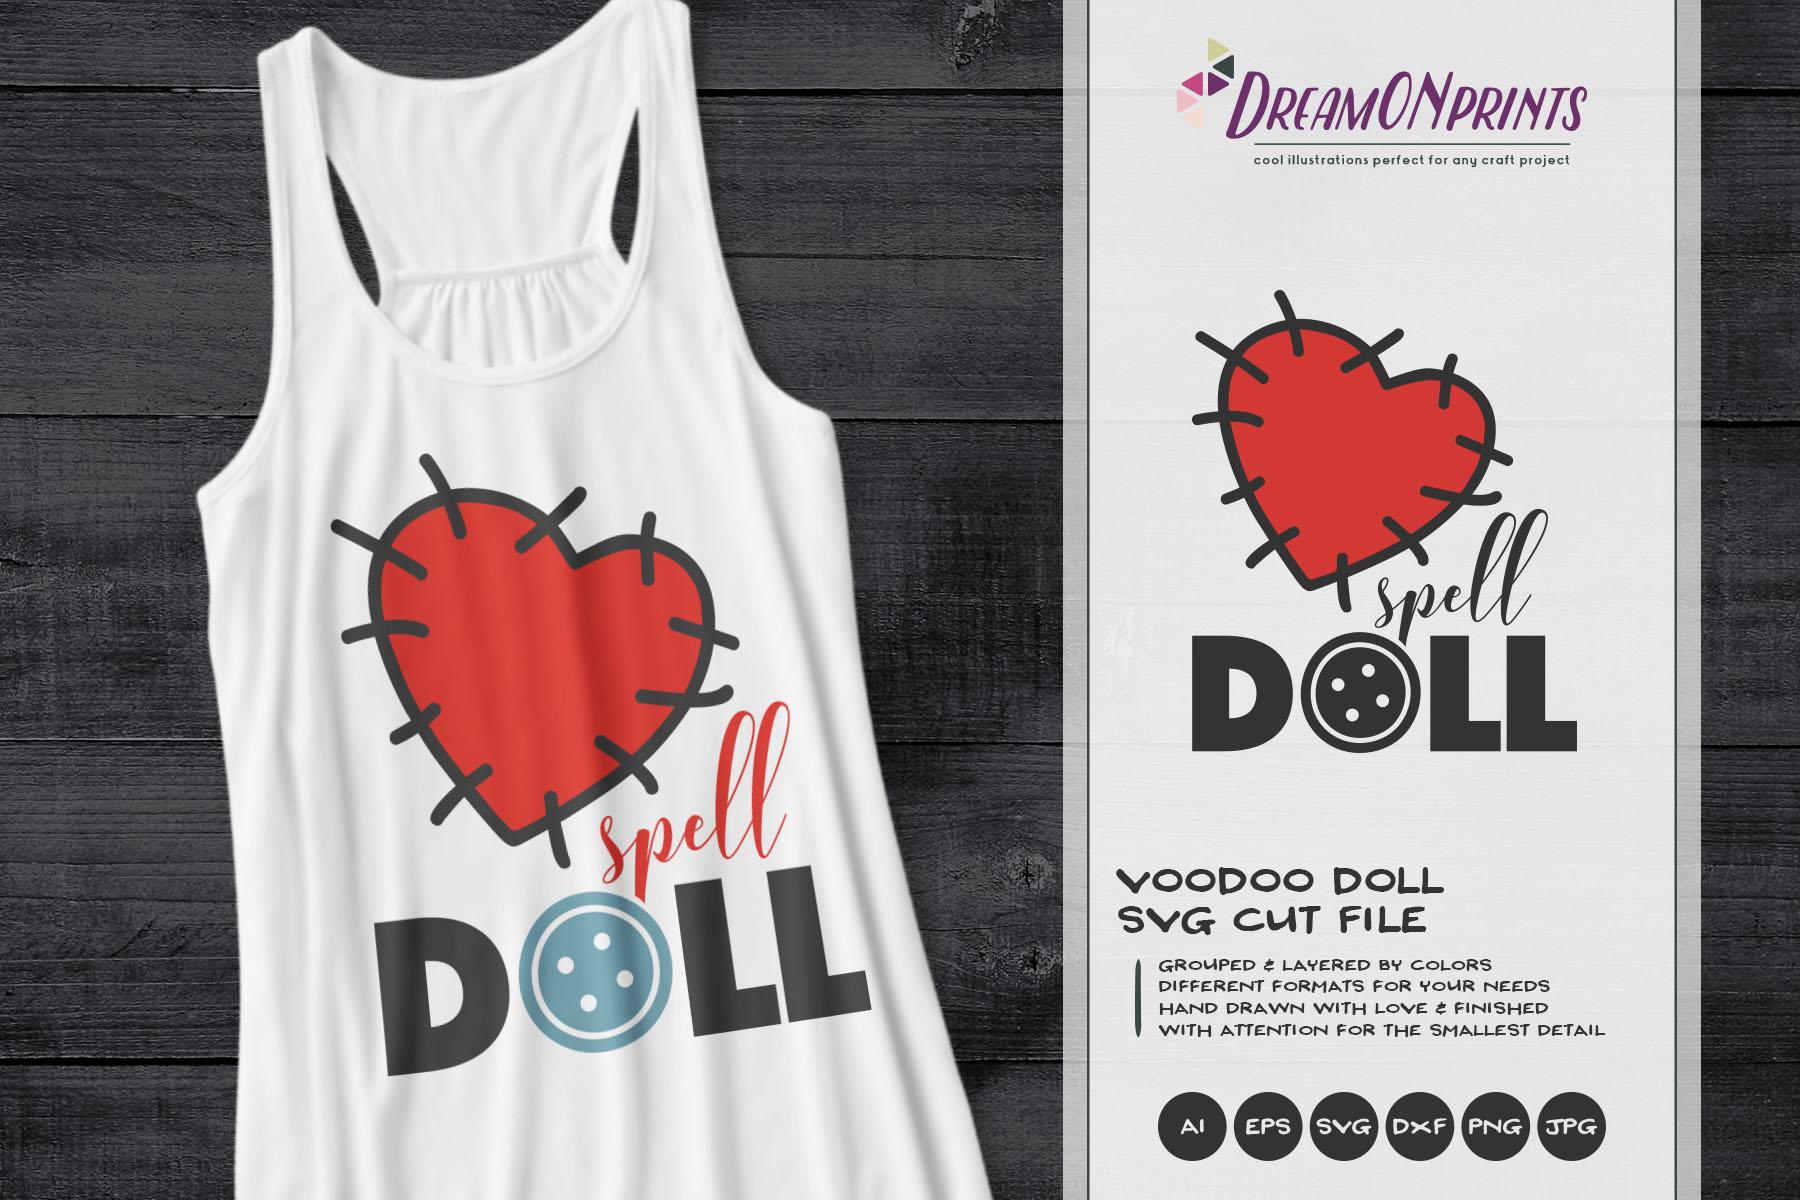 Voodoo Doll SVG | Halloween Costume SVG example image 1